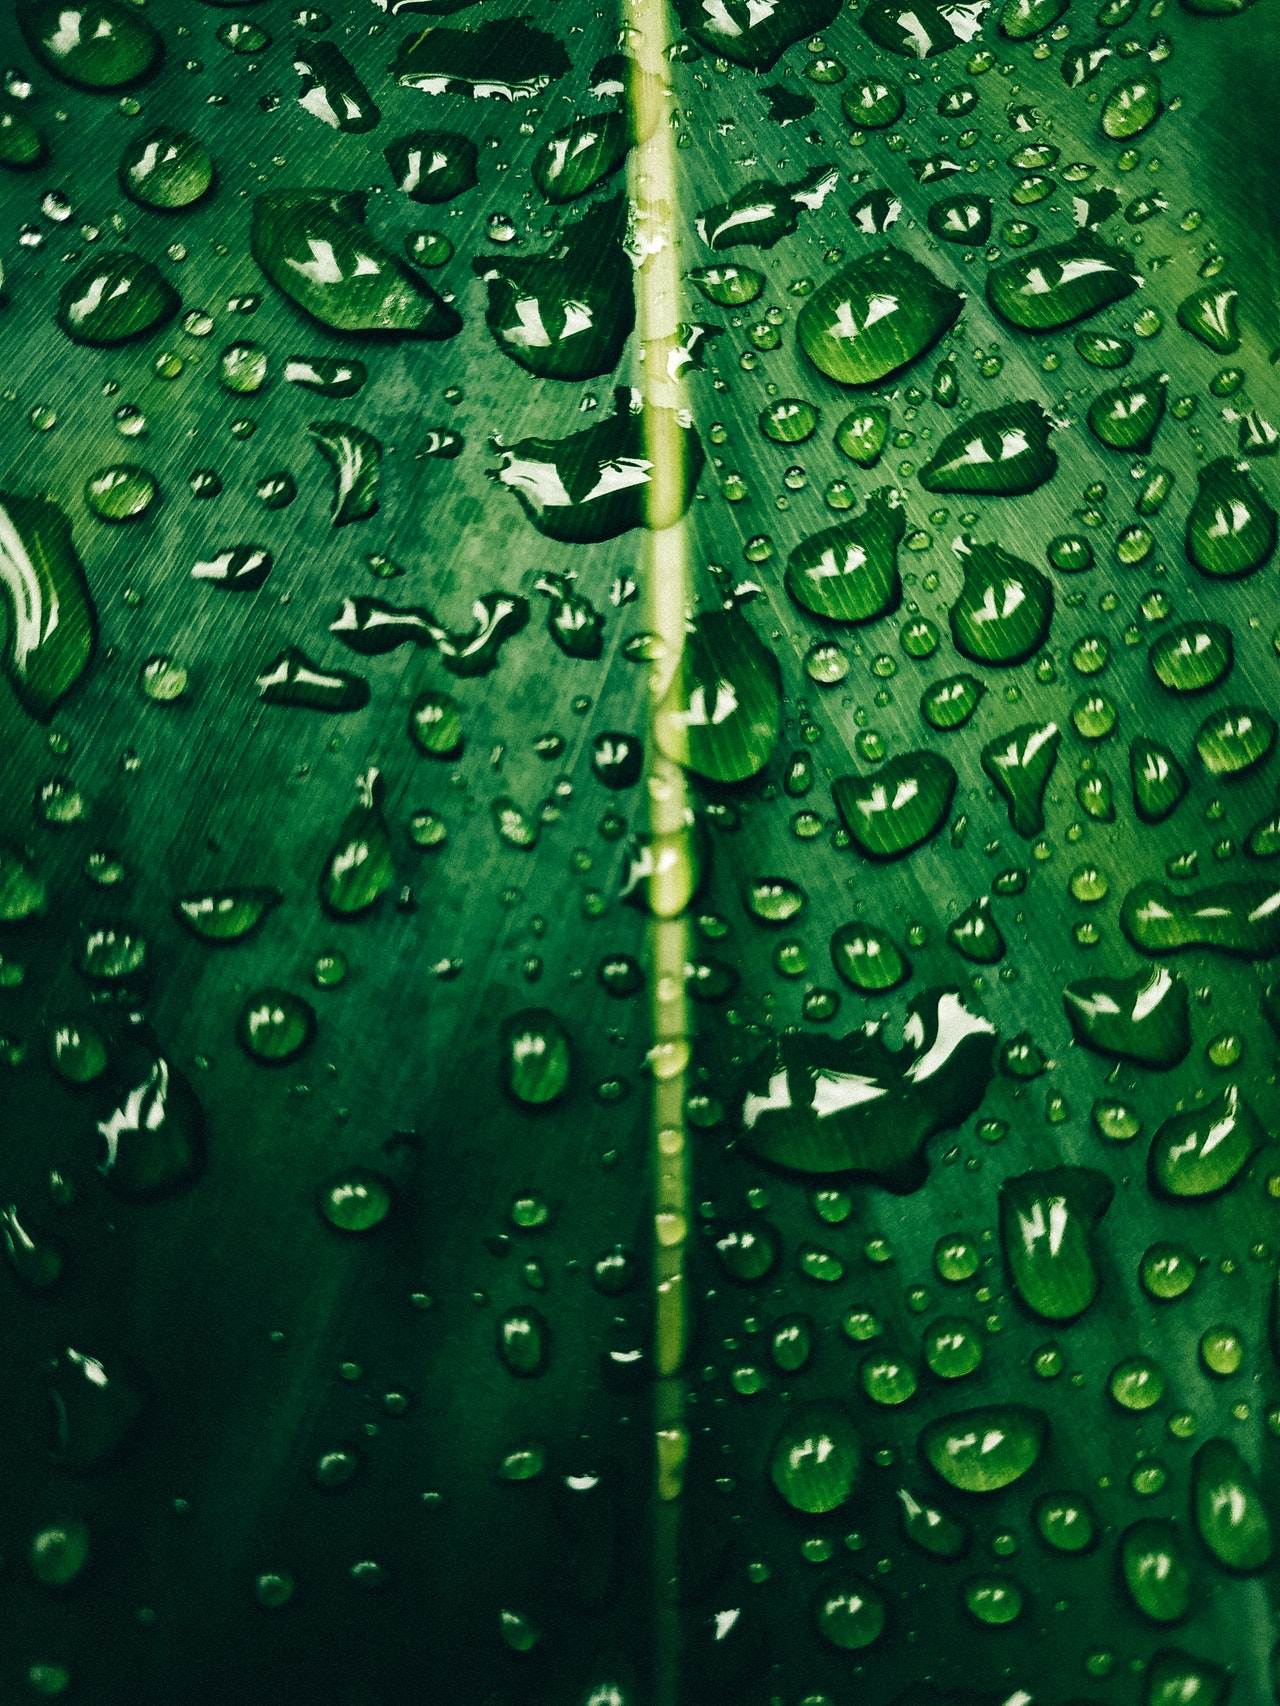 macro-photo-of-water-droplets-on-leaf-3213037